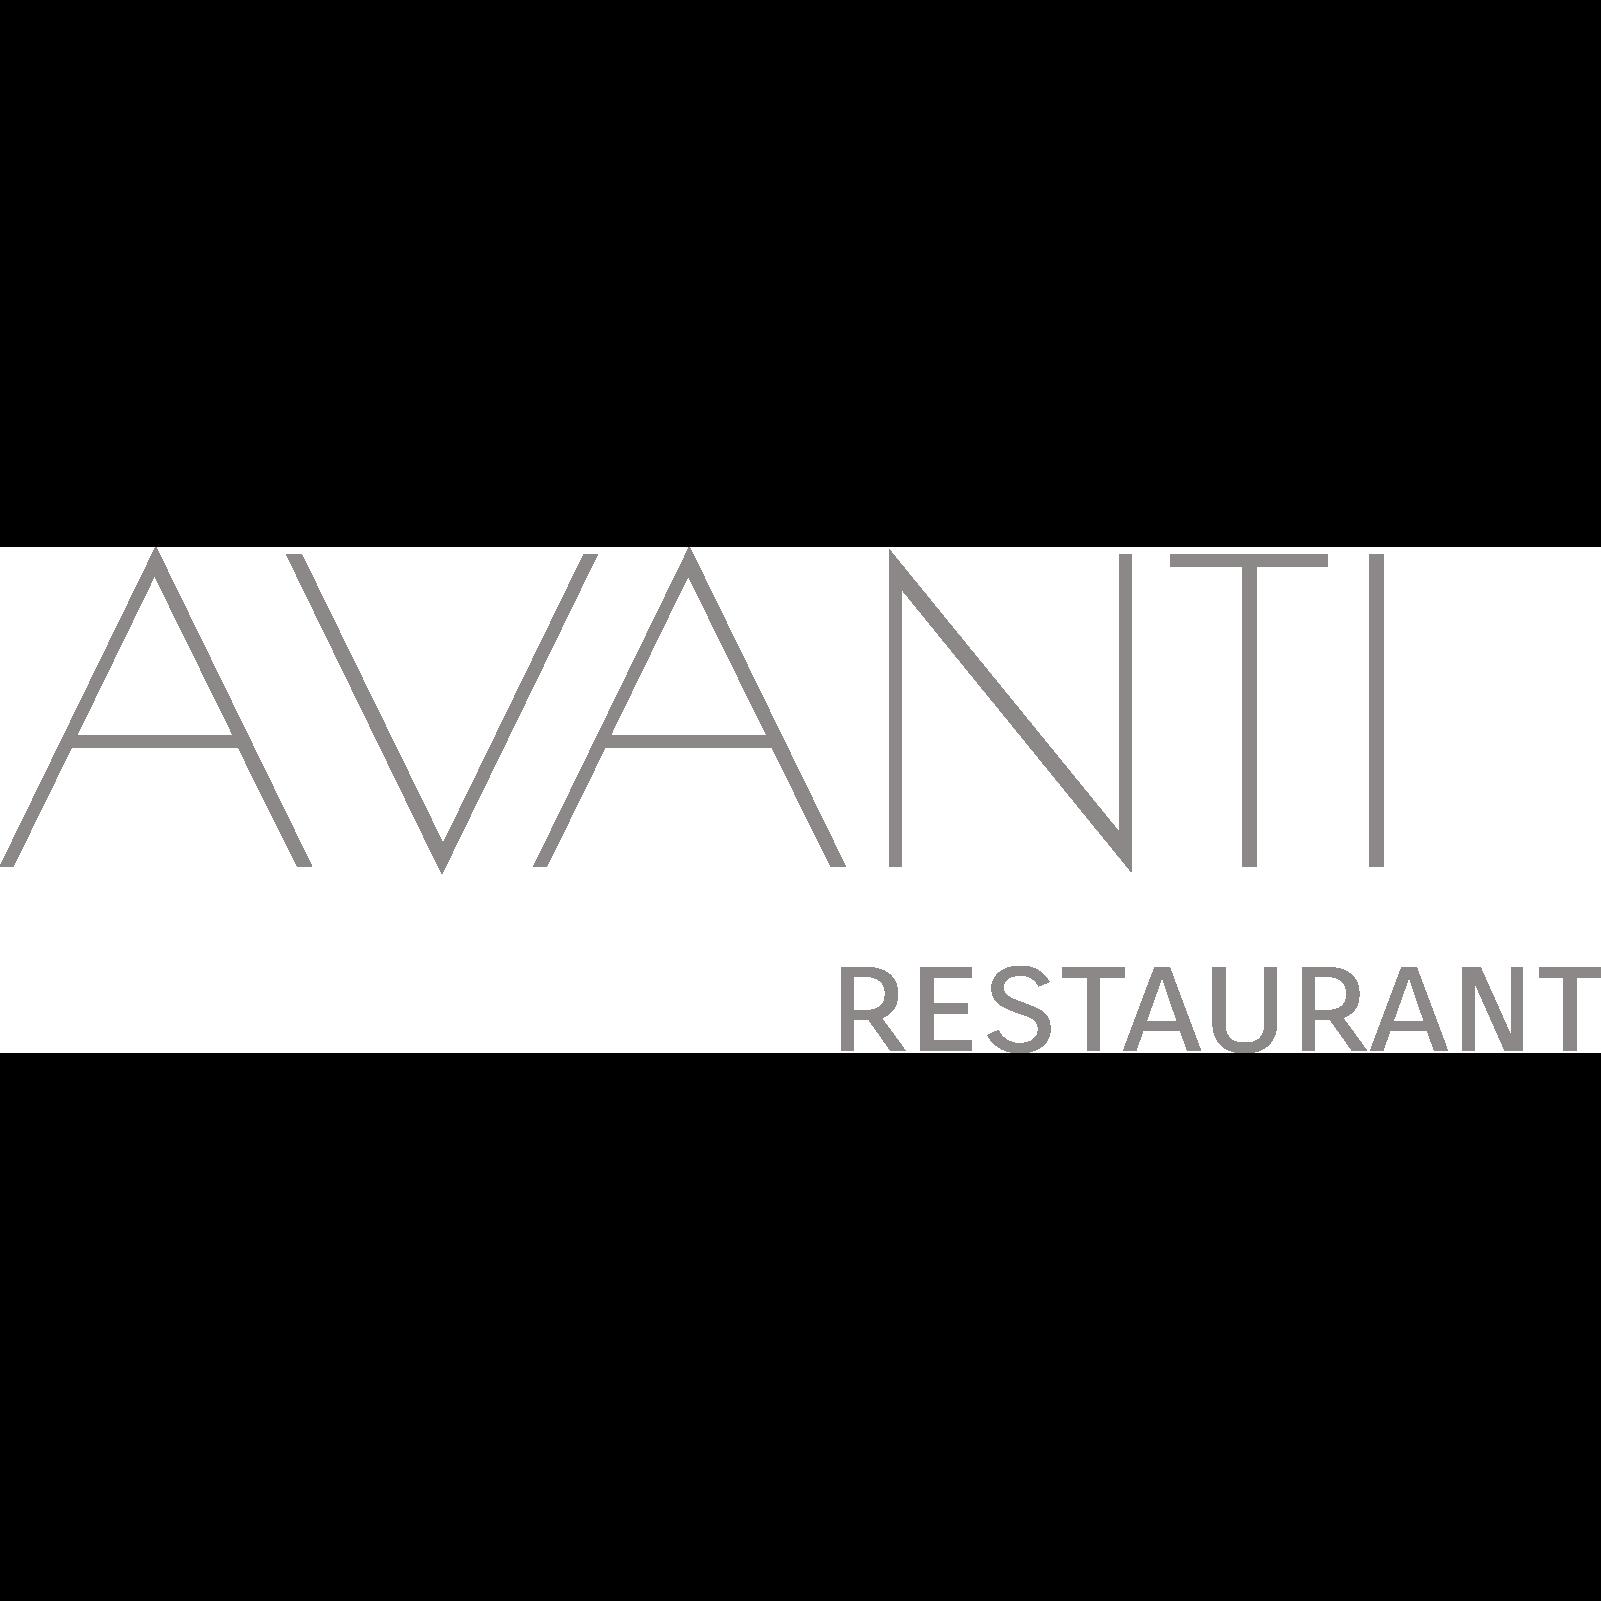 Avanti Restaurant - Meal service(s): Lunch, Dinner